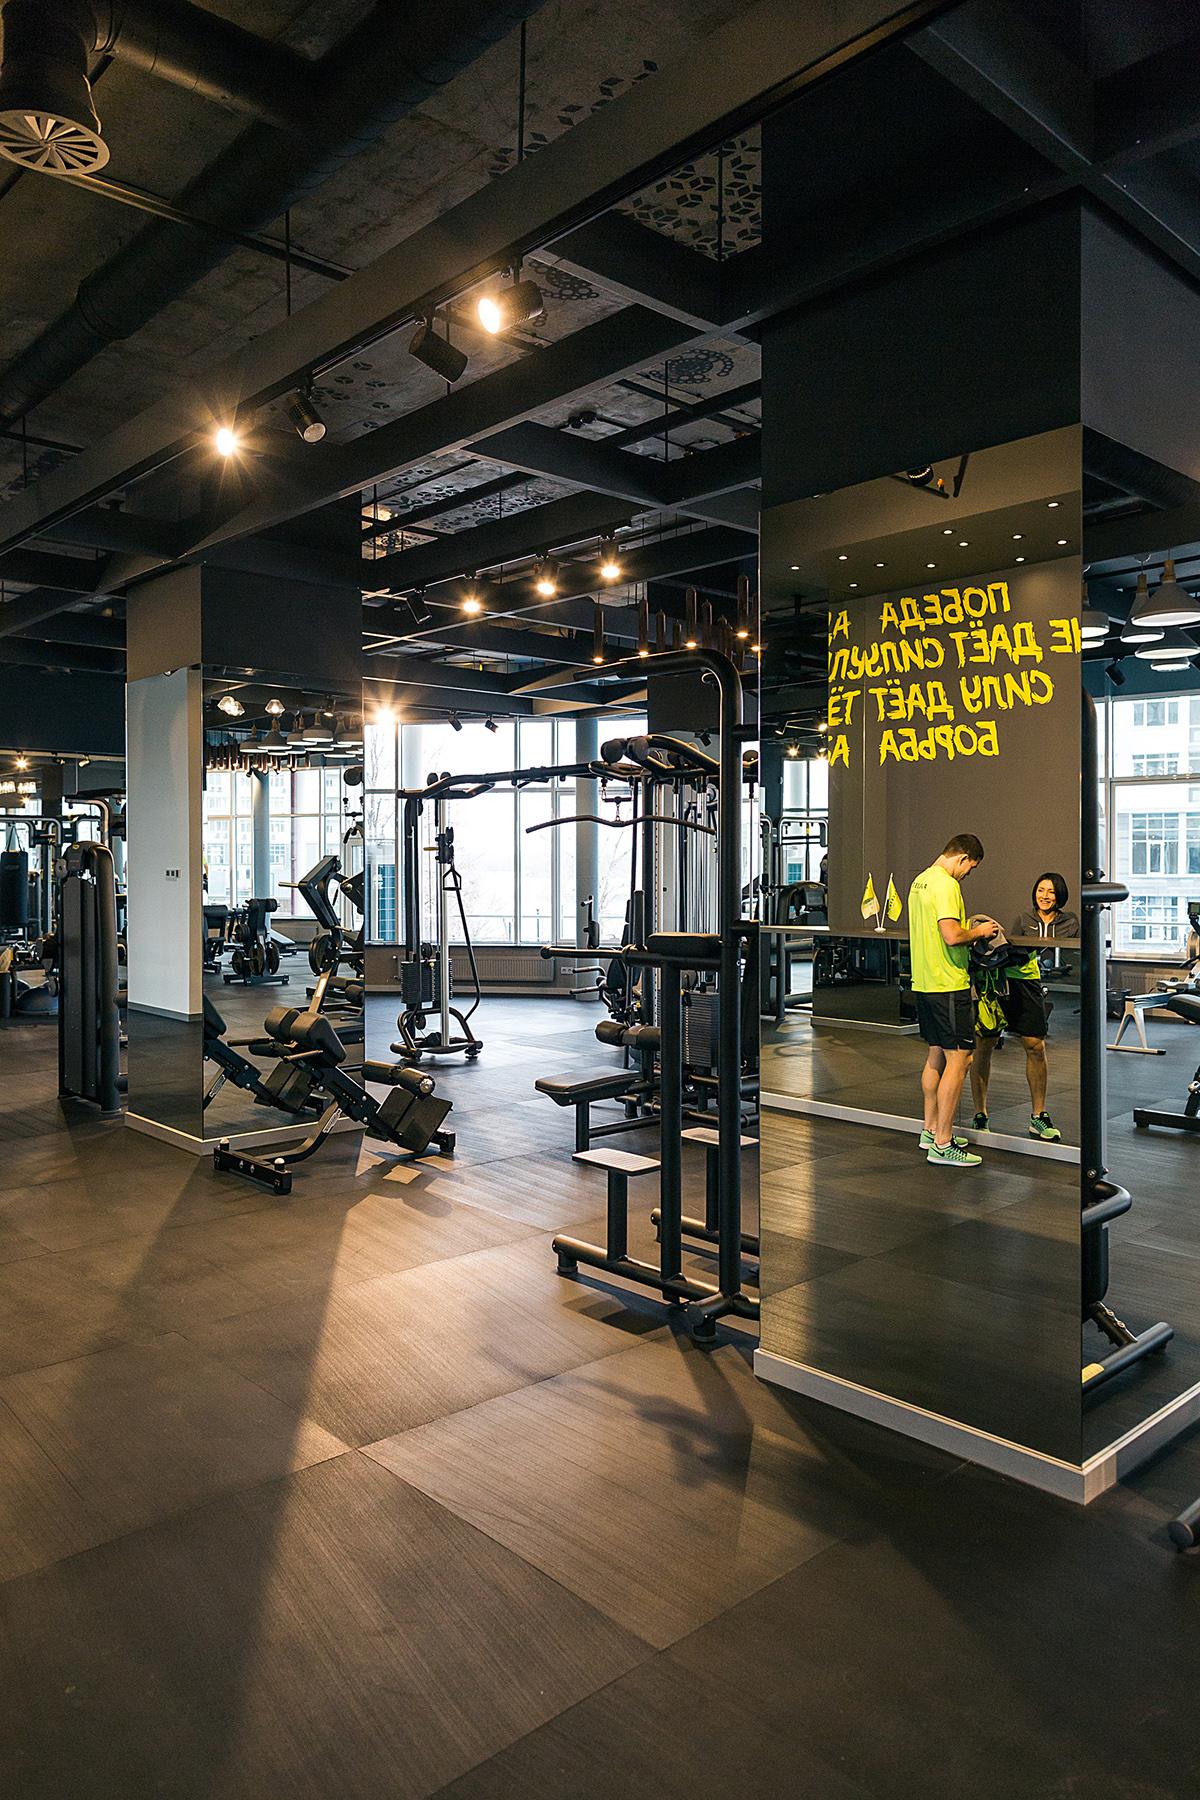 Fitness club palestra on behance for Gimnasio fitness club